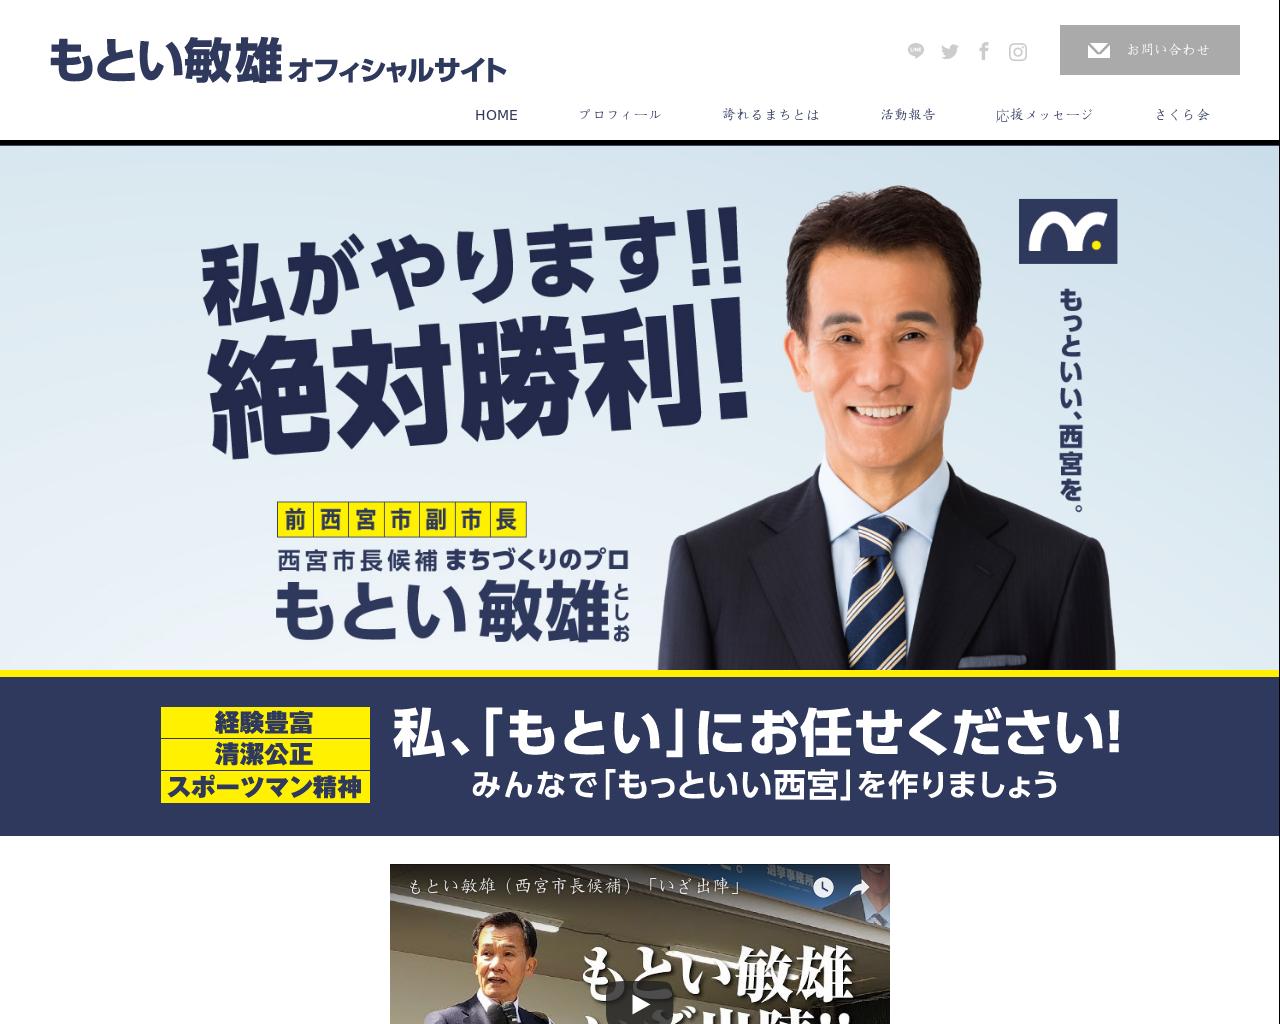 motoi-toshio.com(2018/04/16 03:10:54)